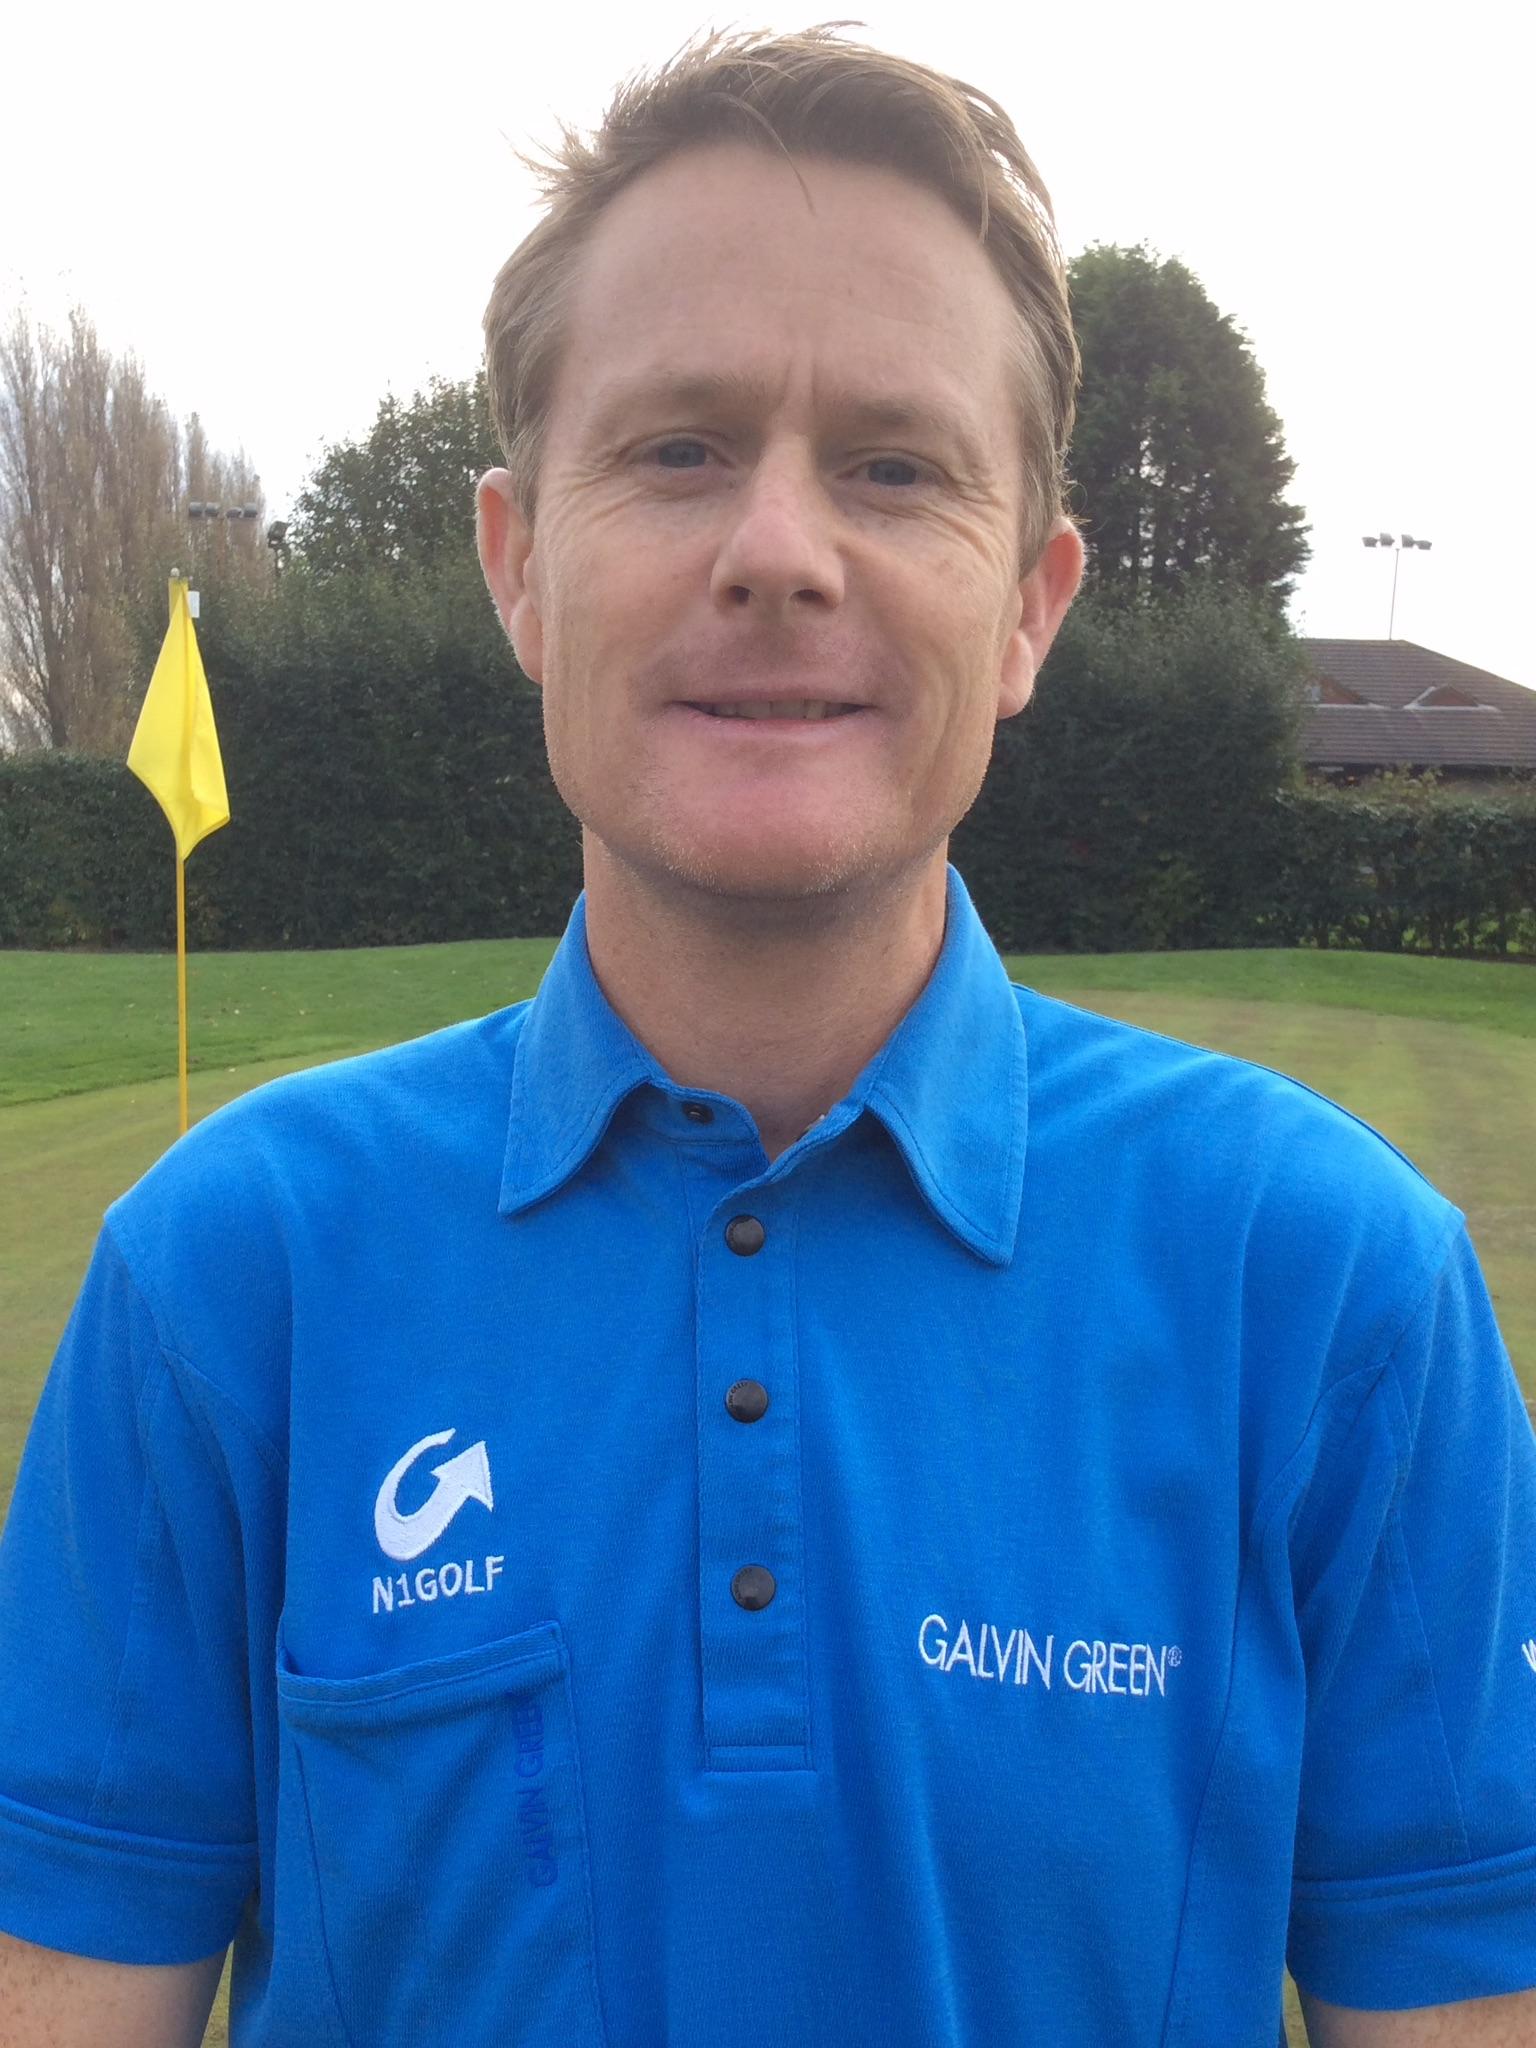 Jason Froggatt Professional Golf Coach N1golf The